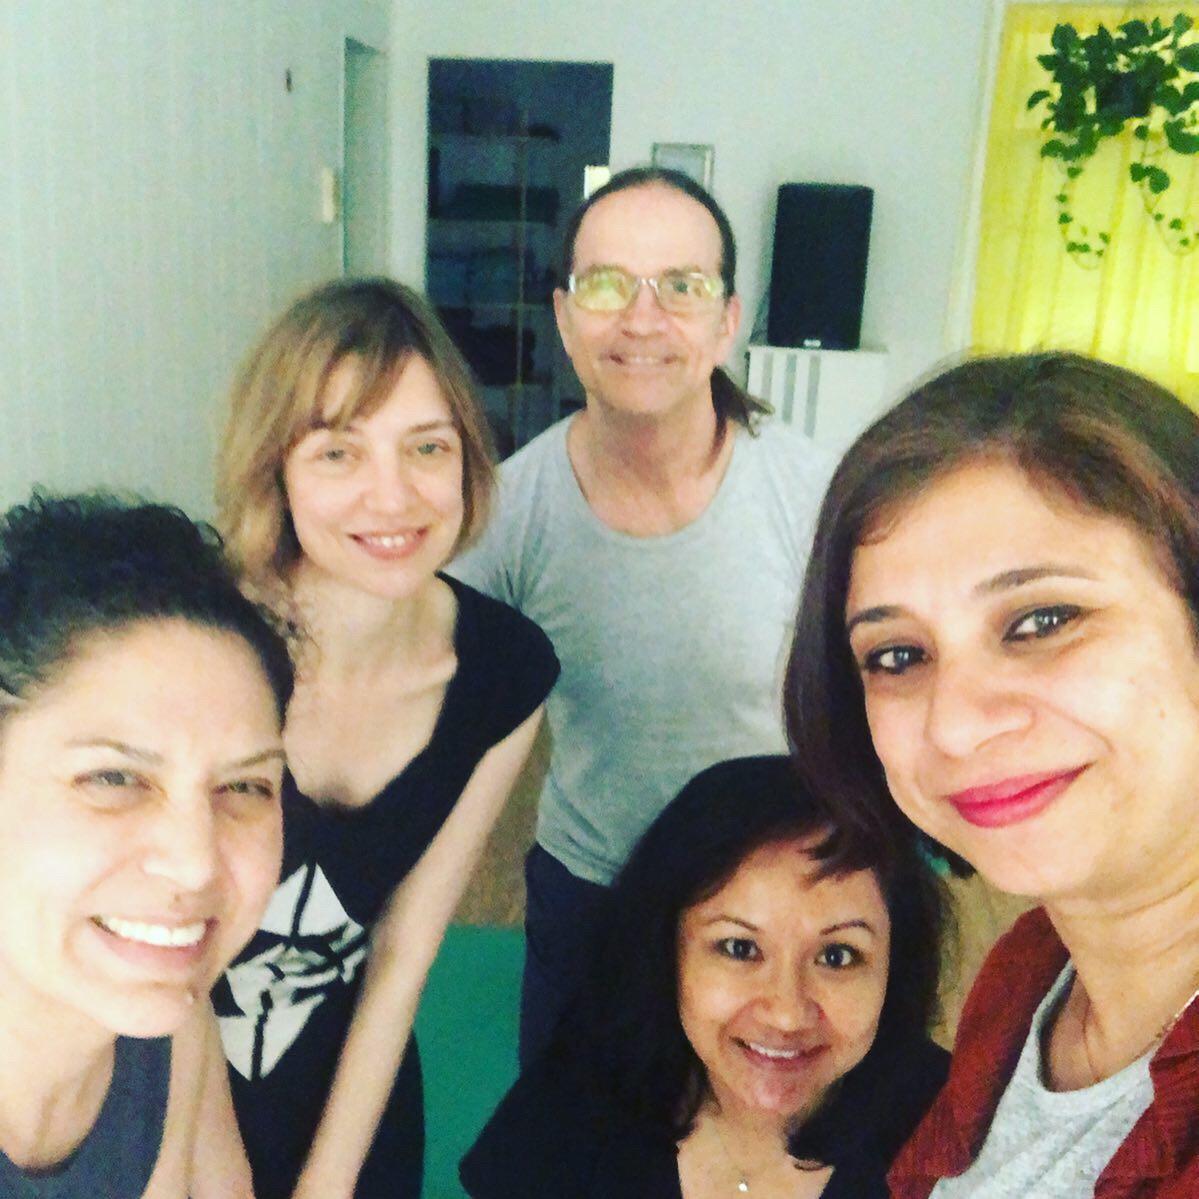 Ayurveda and mindset coaching workshop at 2nd Story Yoga + Pilates, NYC